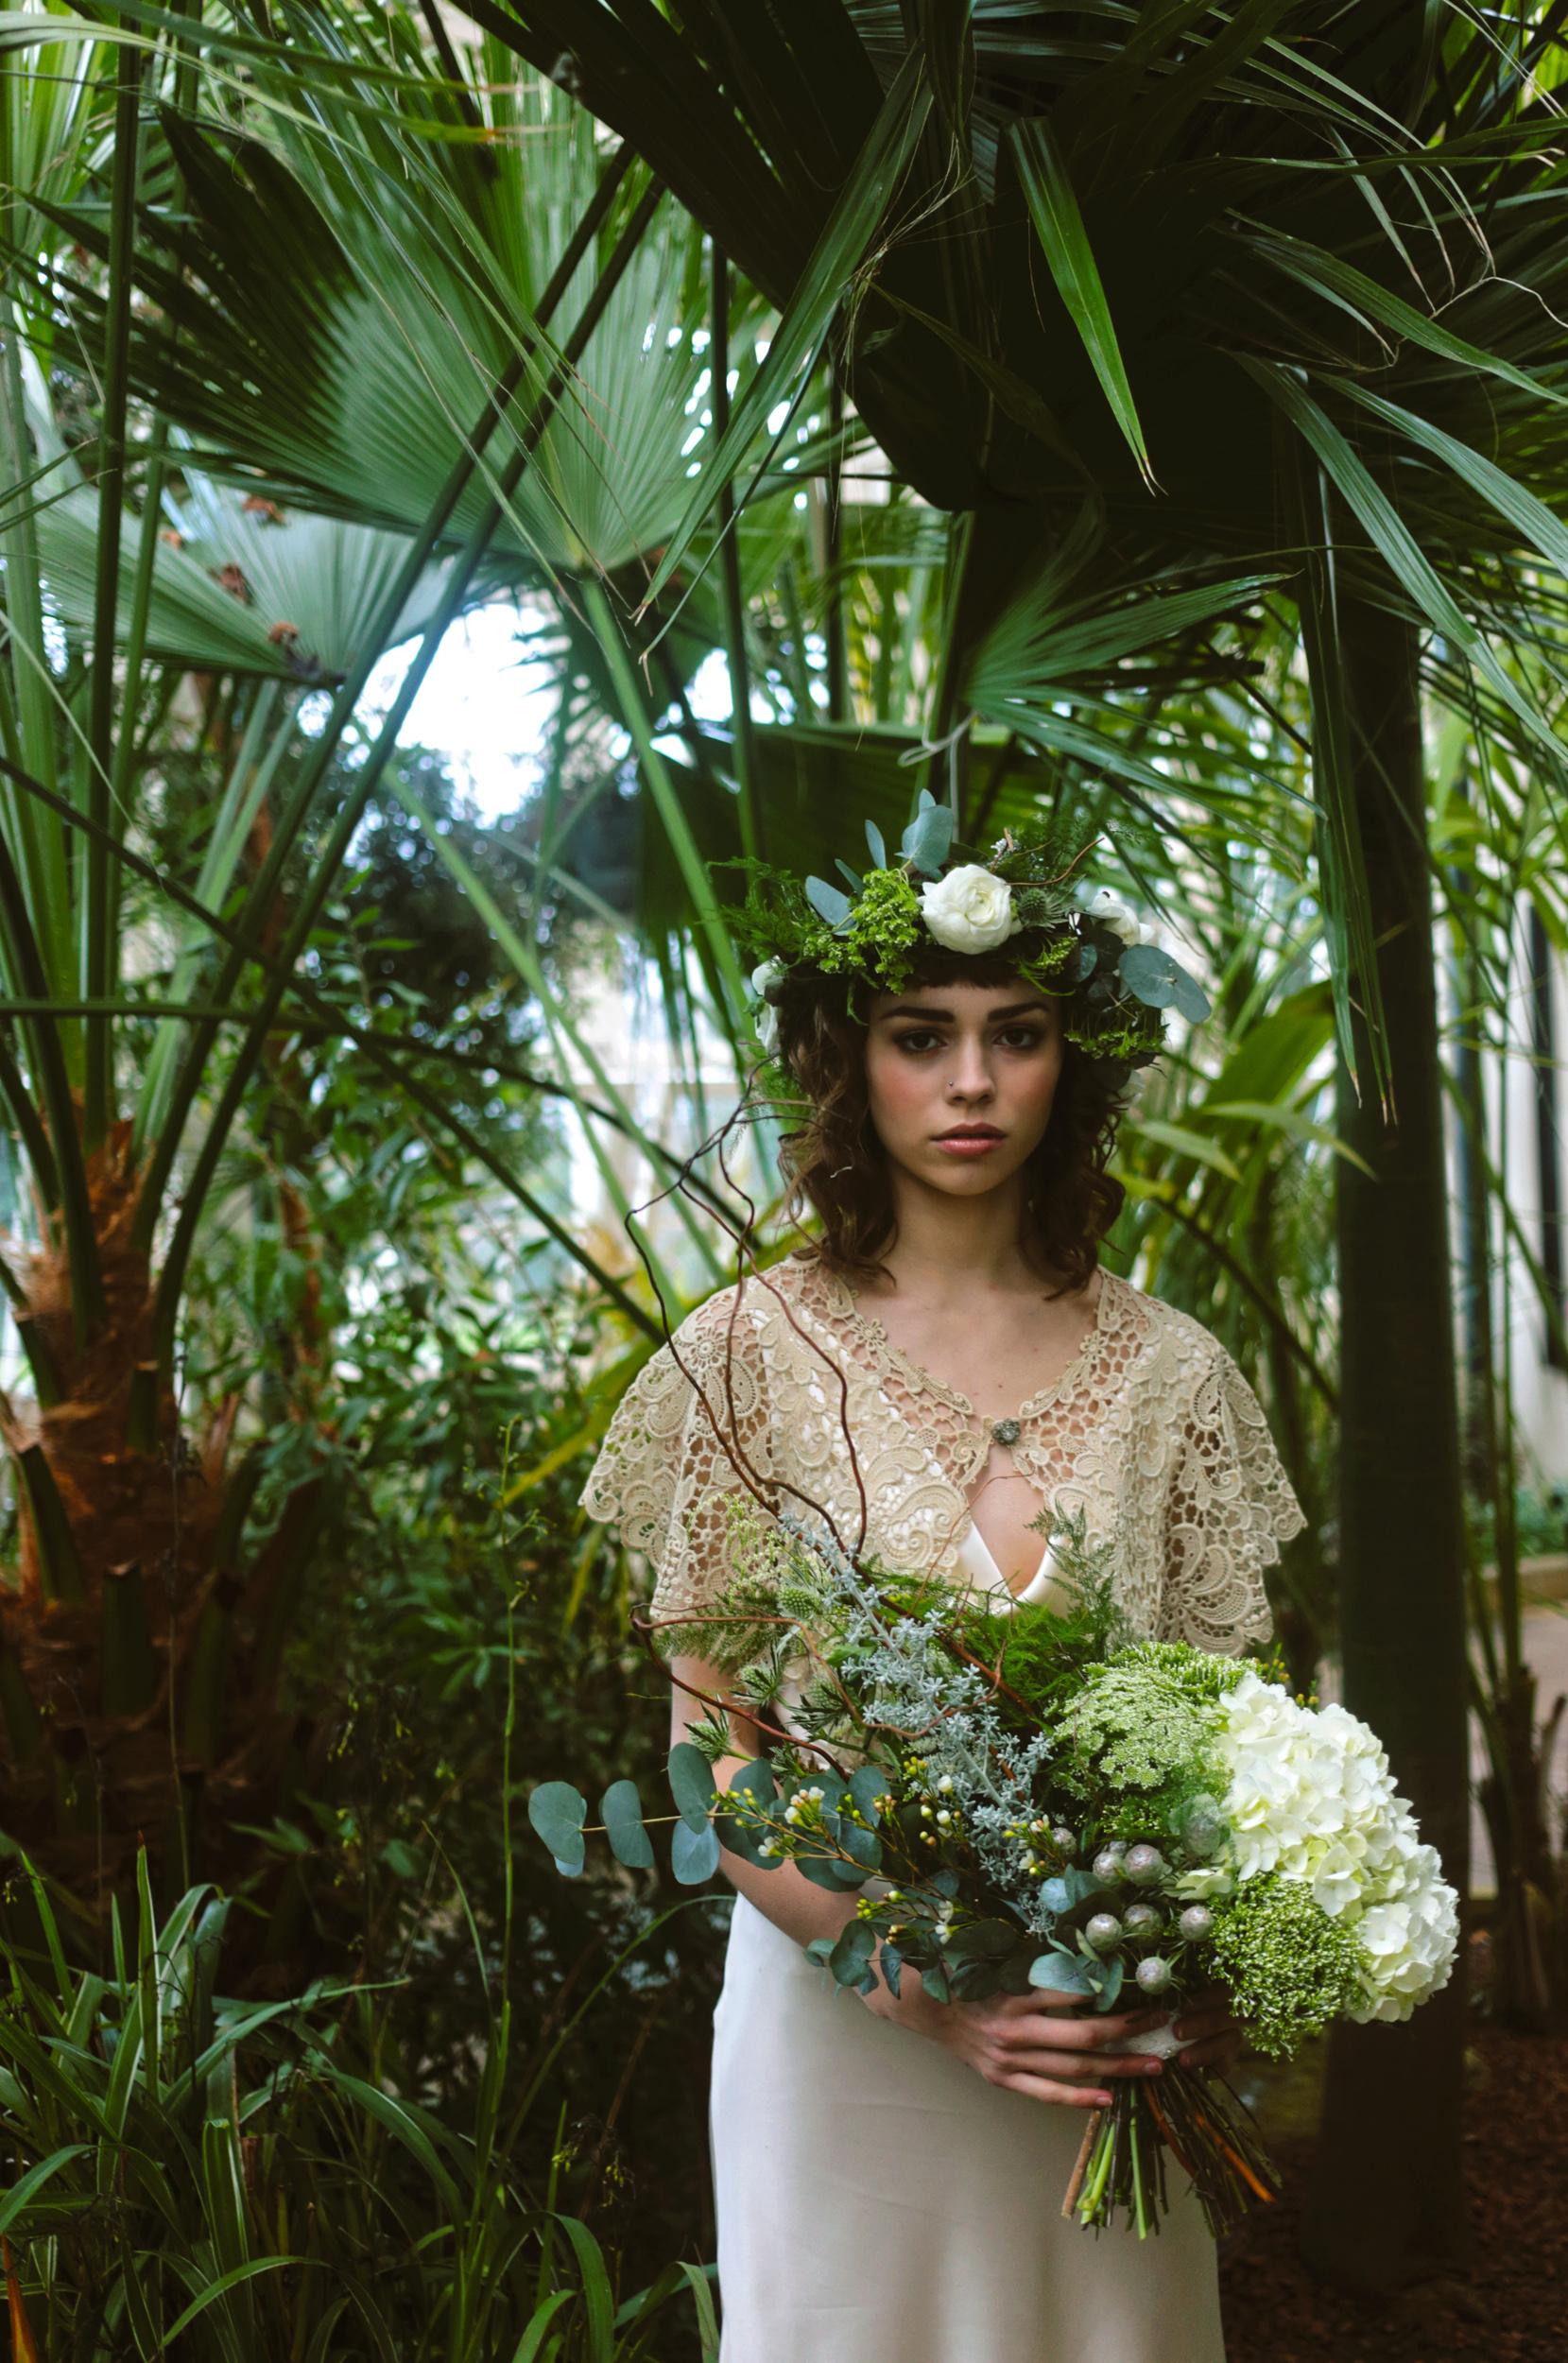 Winter-Bridal-Kate-Beaumont-Shelley-Richmond-Vintage-Wedding-Dress-13.jpg